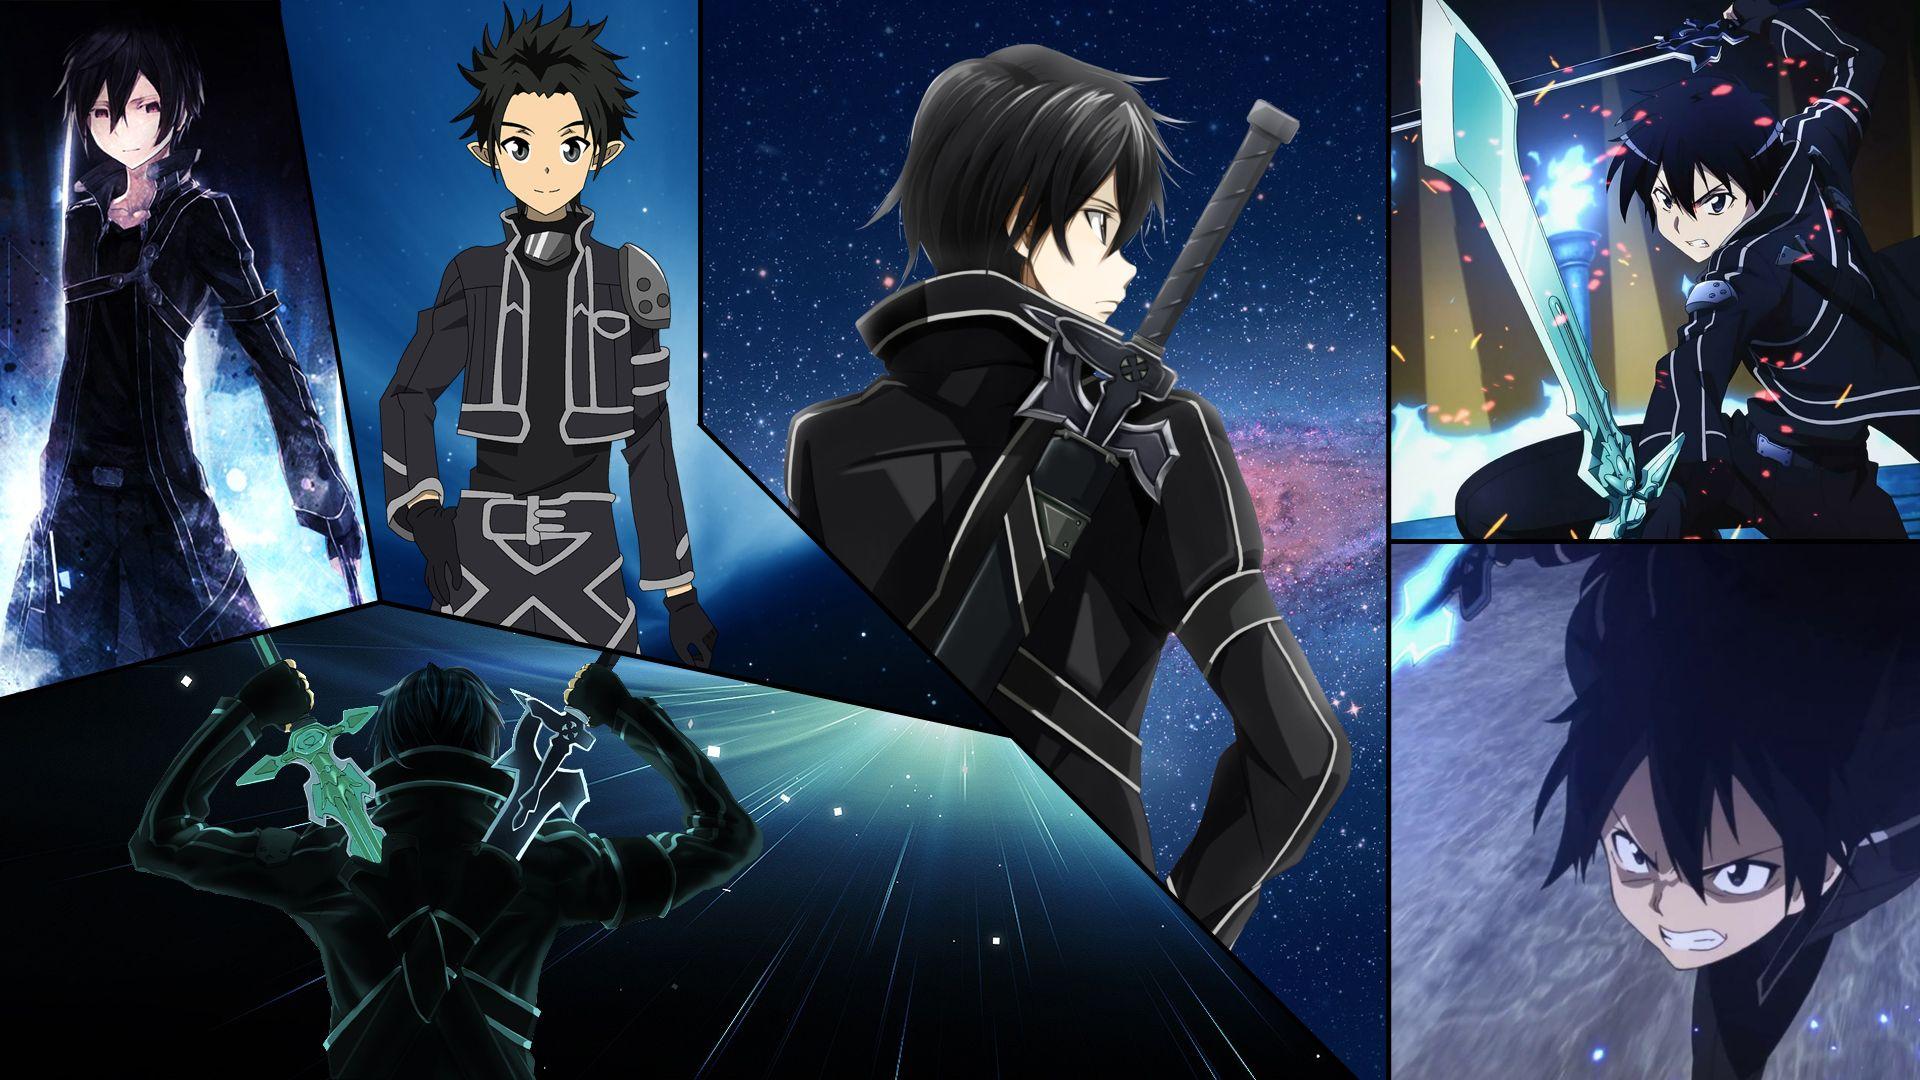 Kirito Collage By Dinocojv Anime